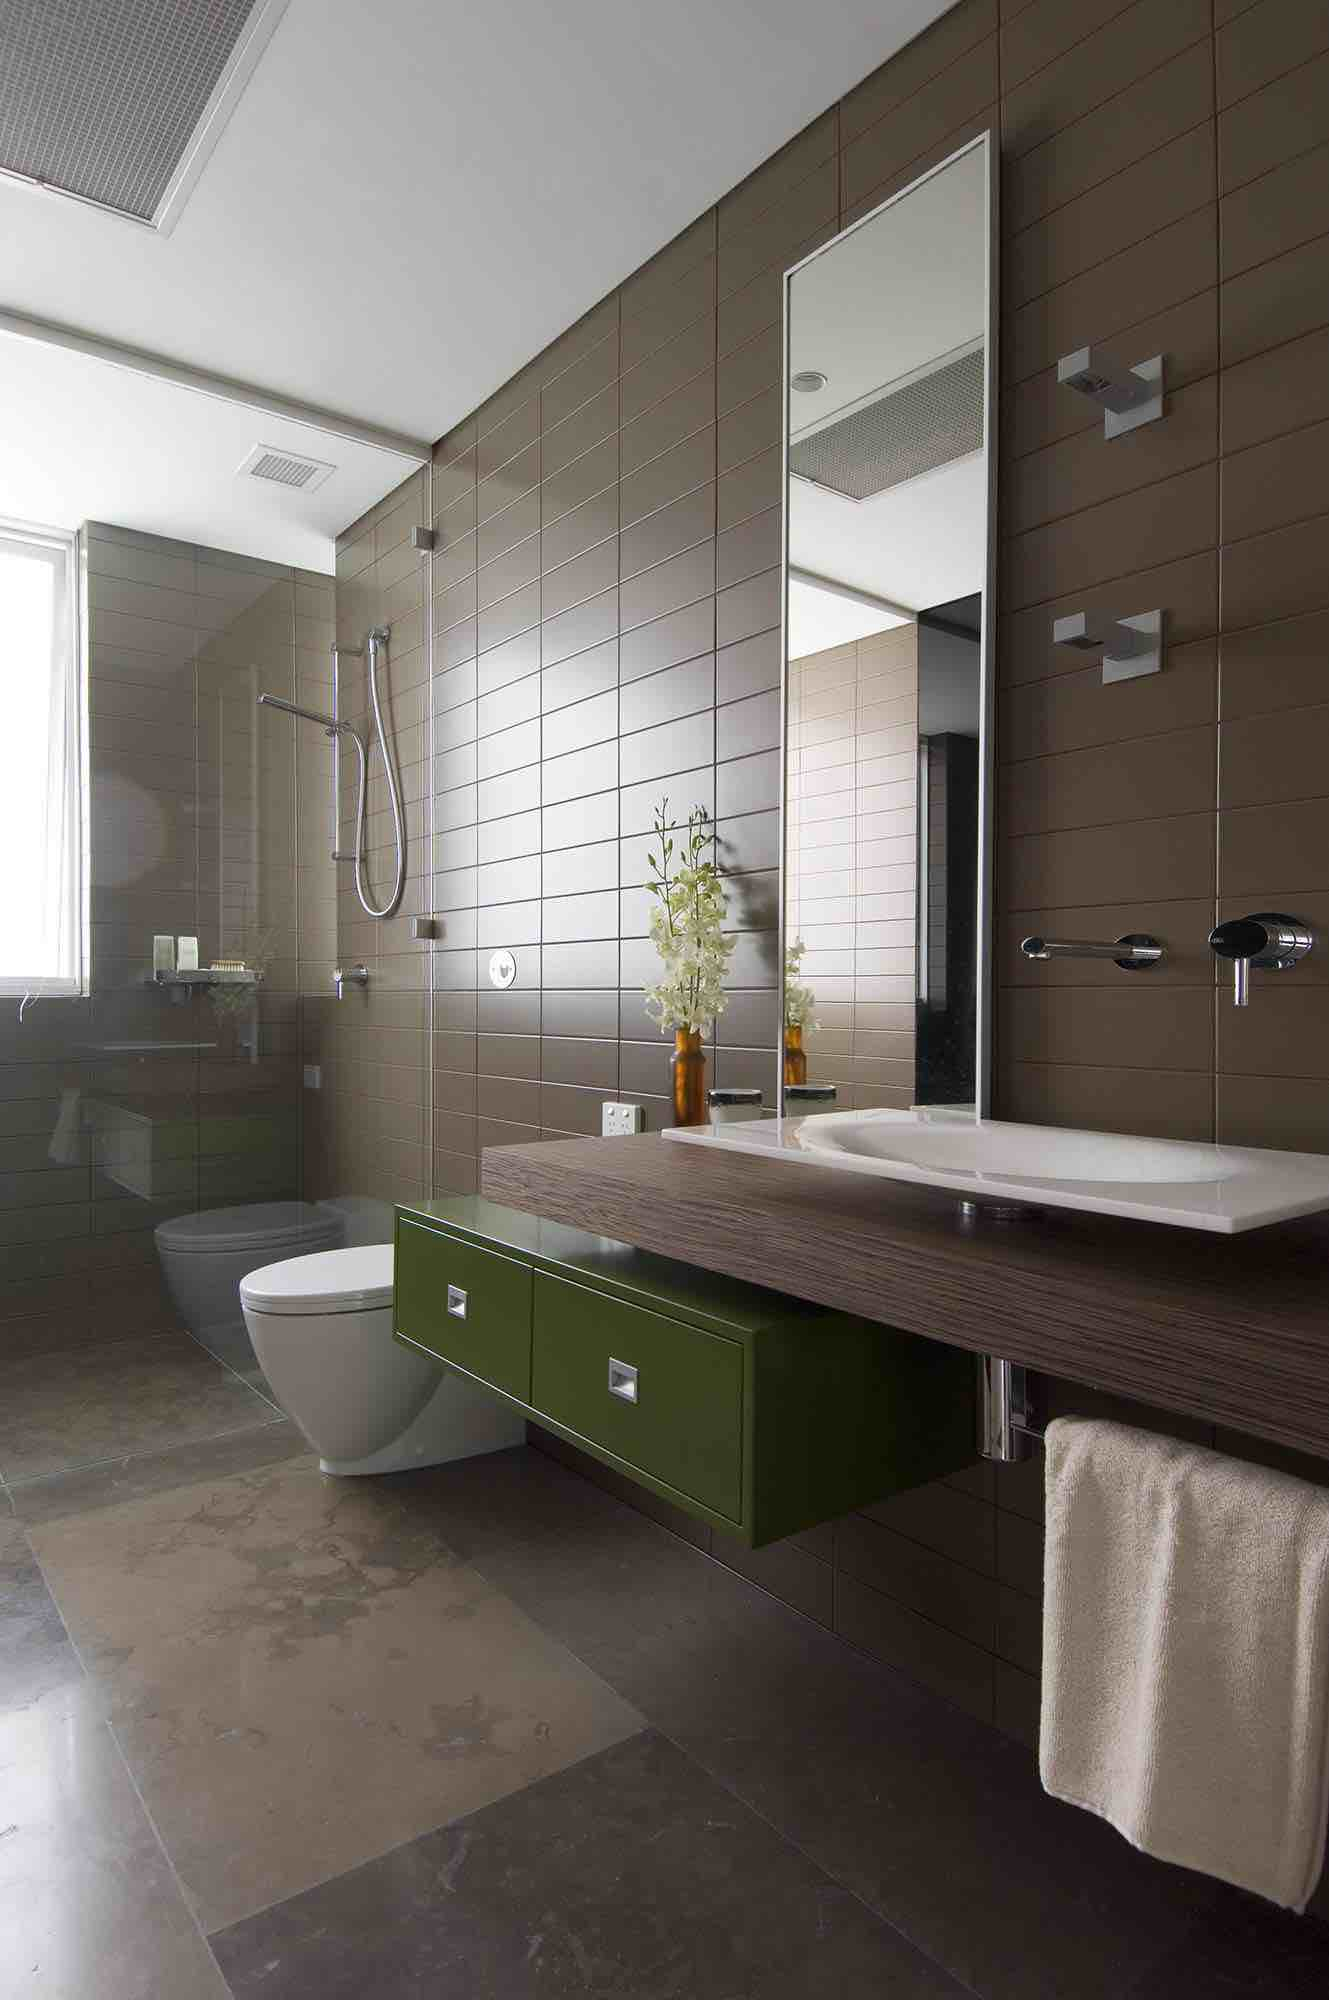 minosa-design-modern-bathroom-floating-vanity-portlans-st-bathroom-puddle-gessi-ovale-dover-heights-01